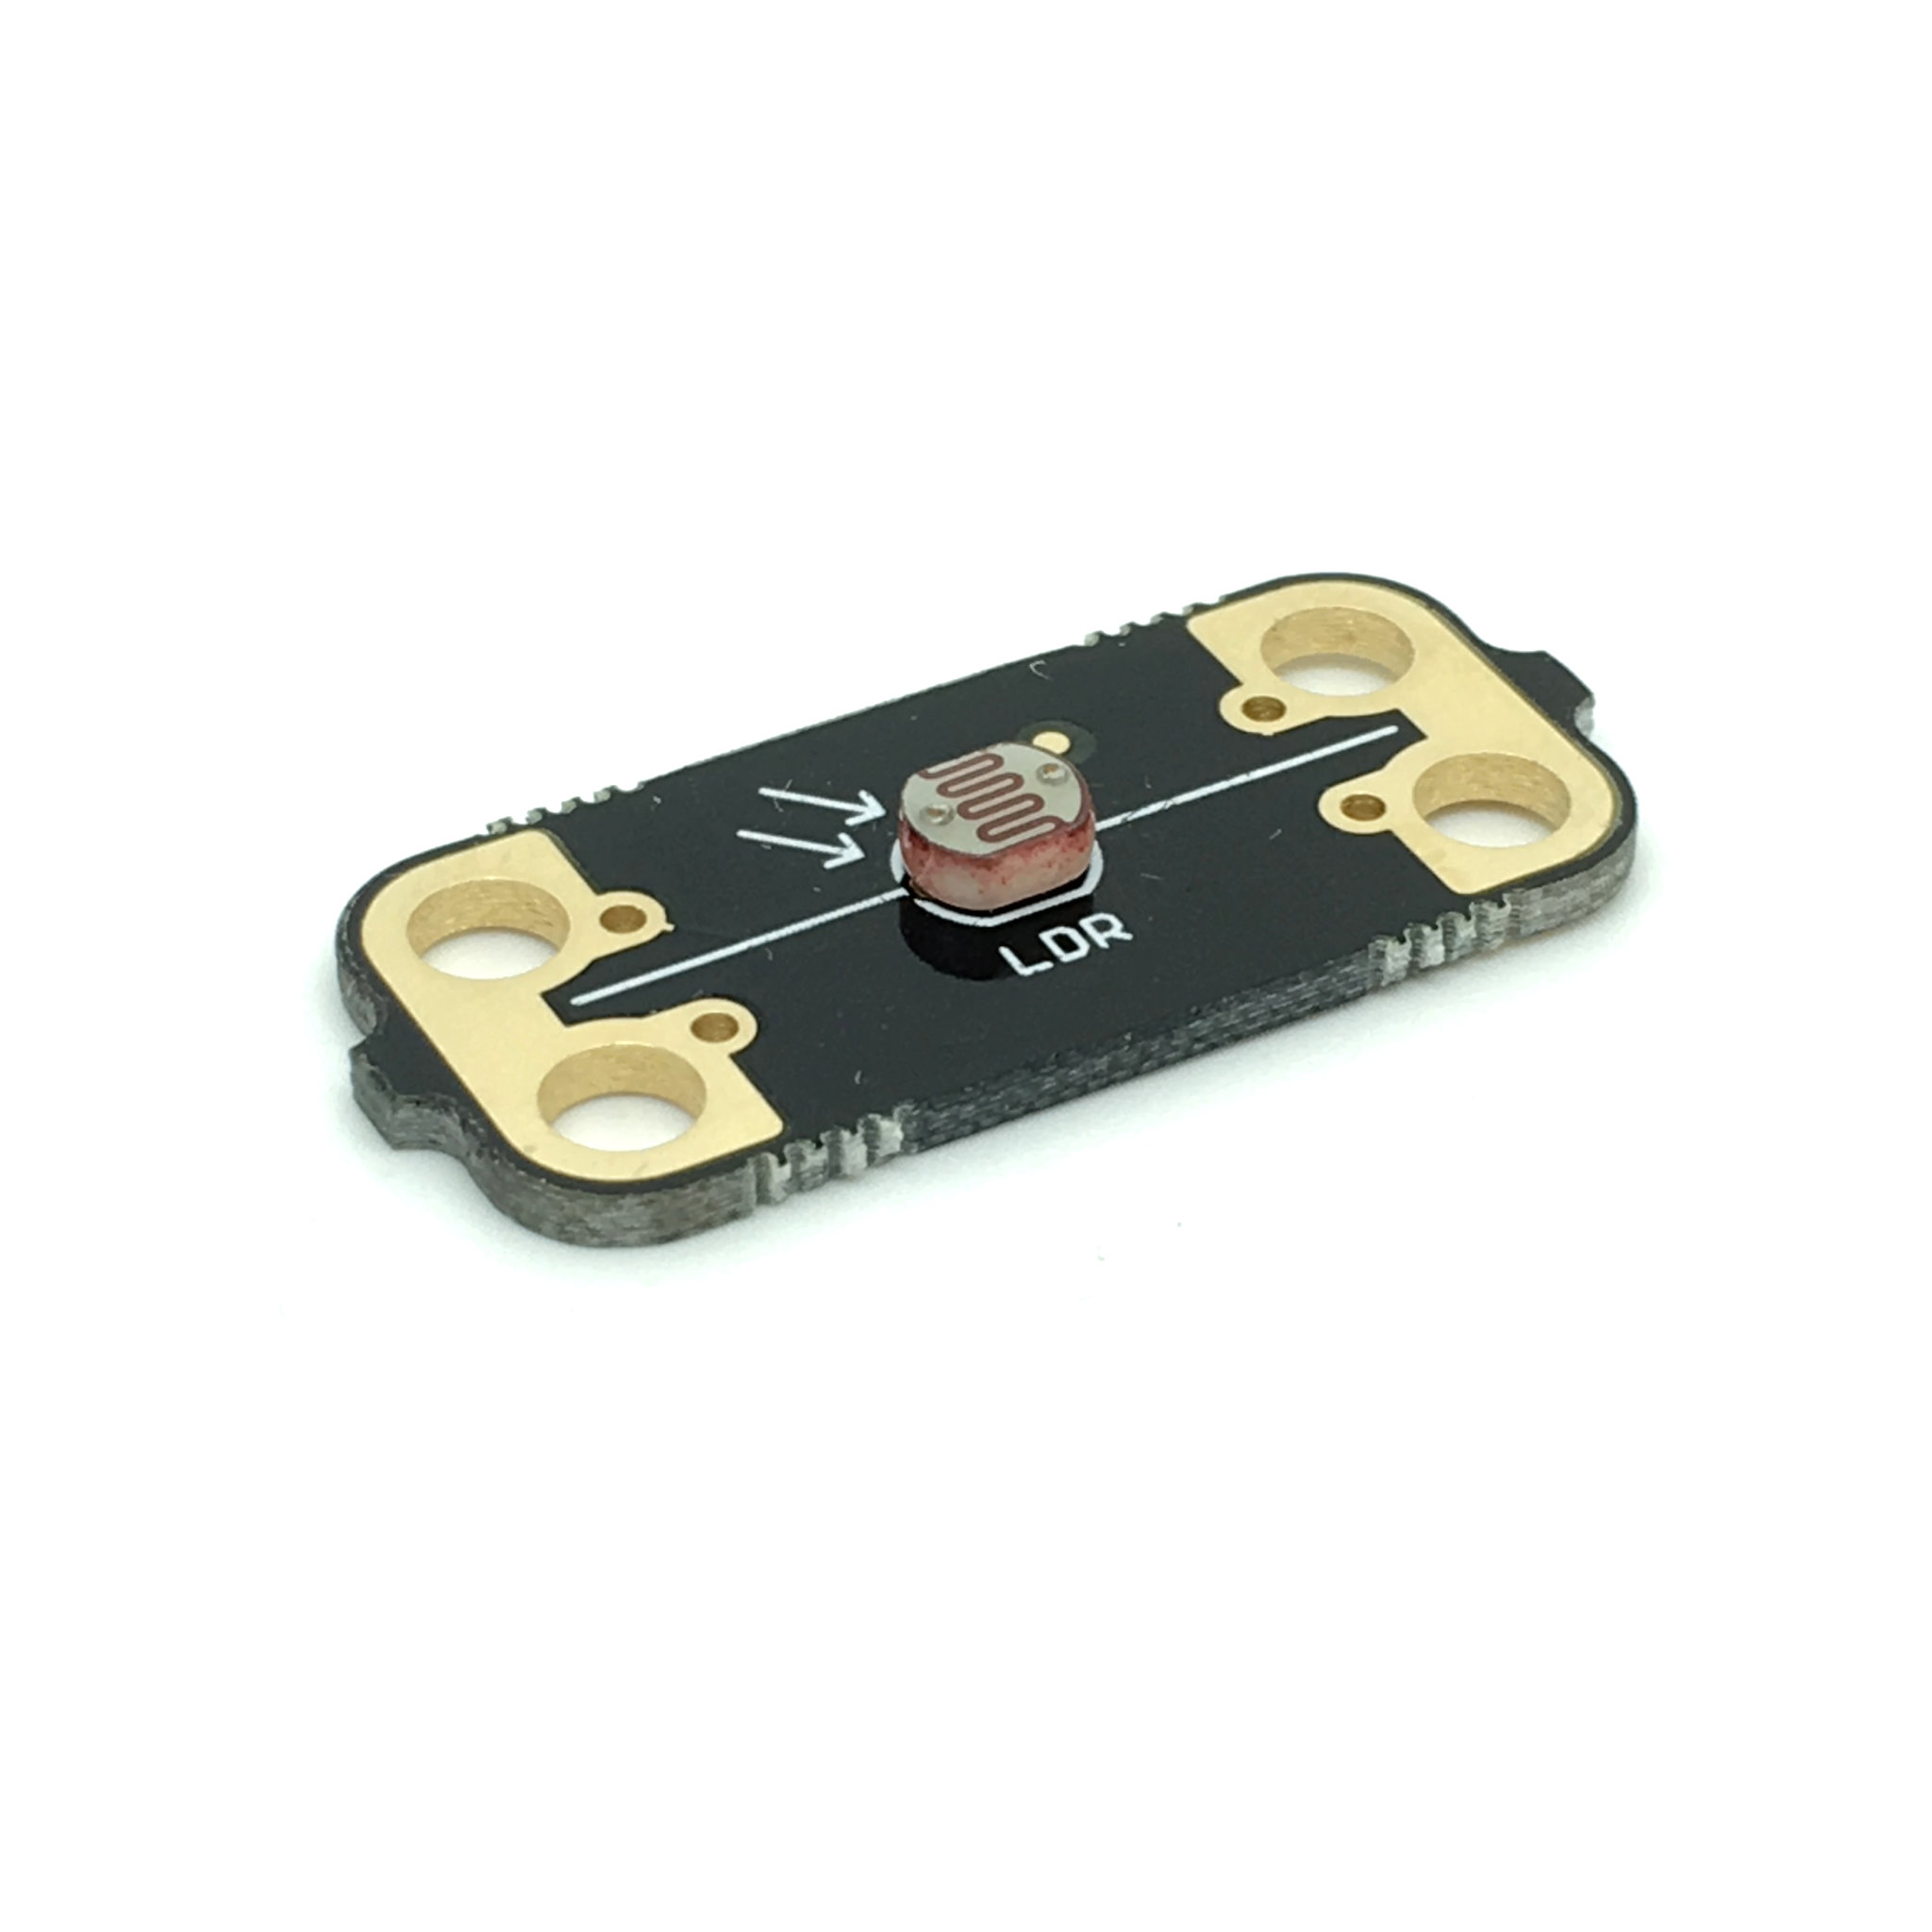 Crumble-friendly LDR | Redfern Electronics